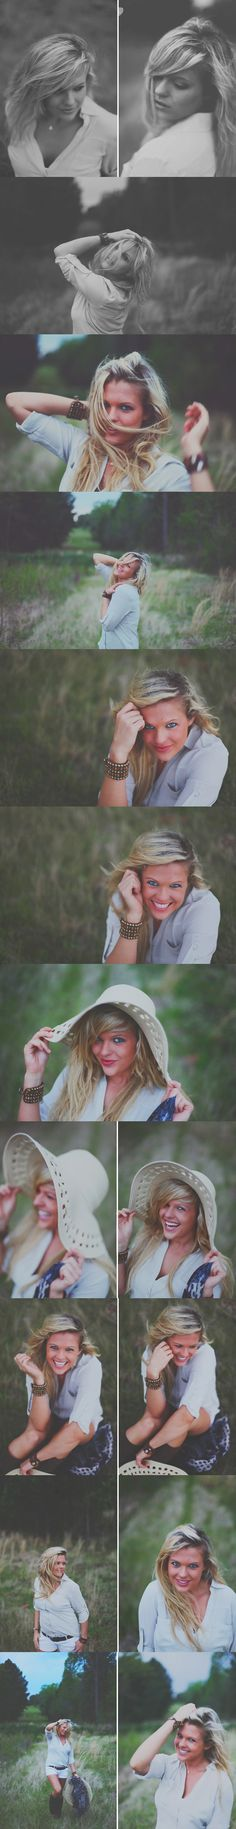 Kendra Michelle Photography Portrait Photography Inspiration